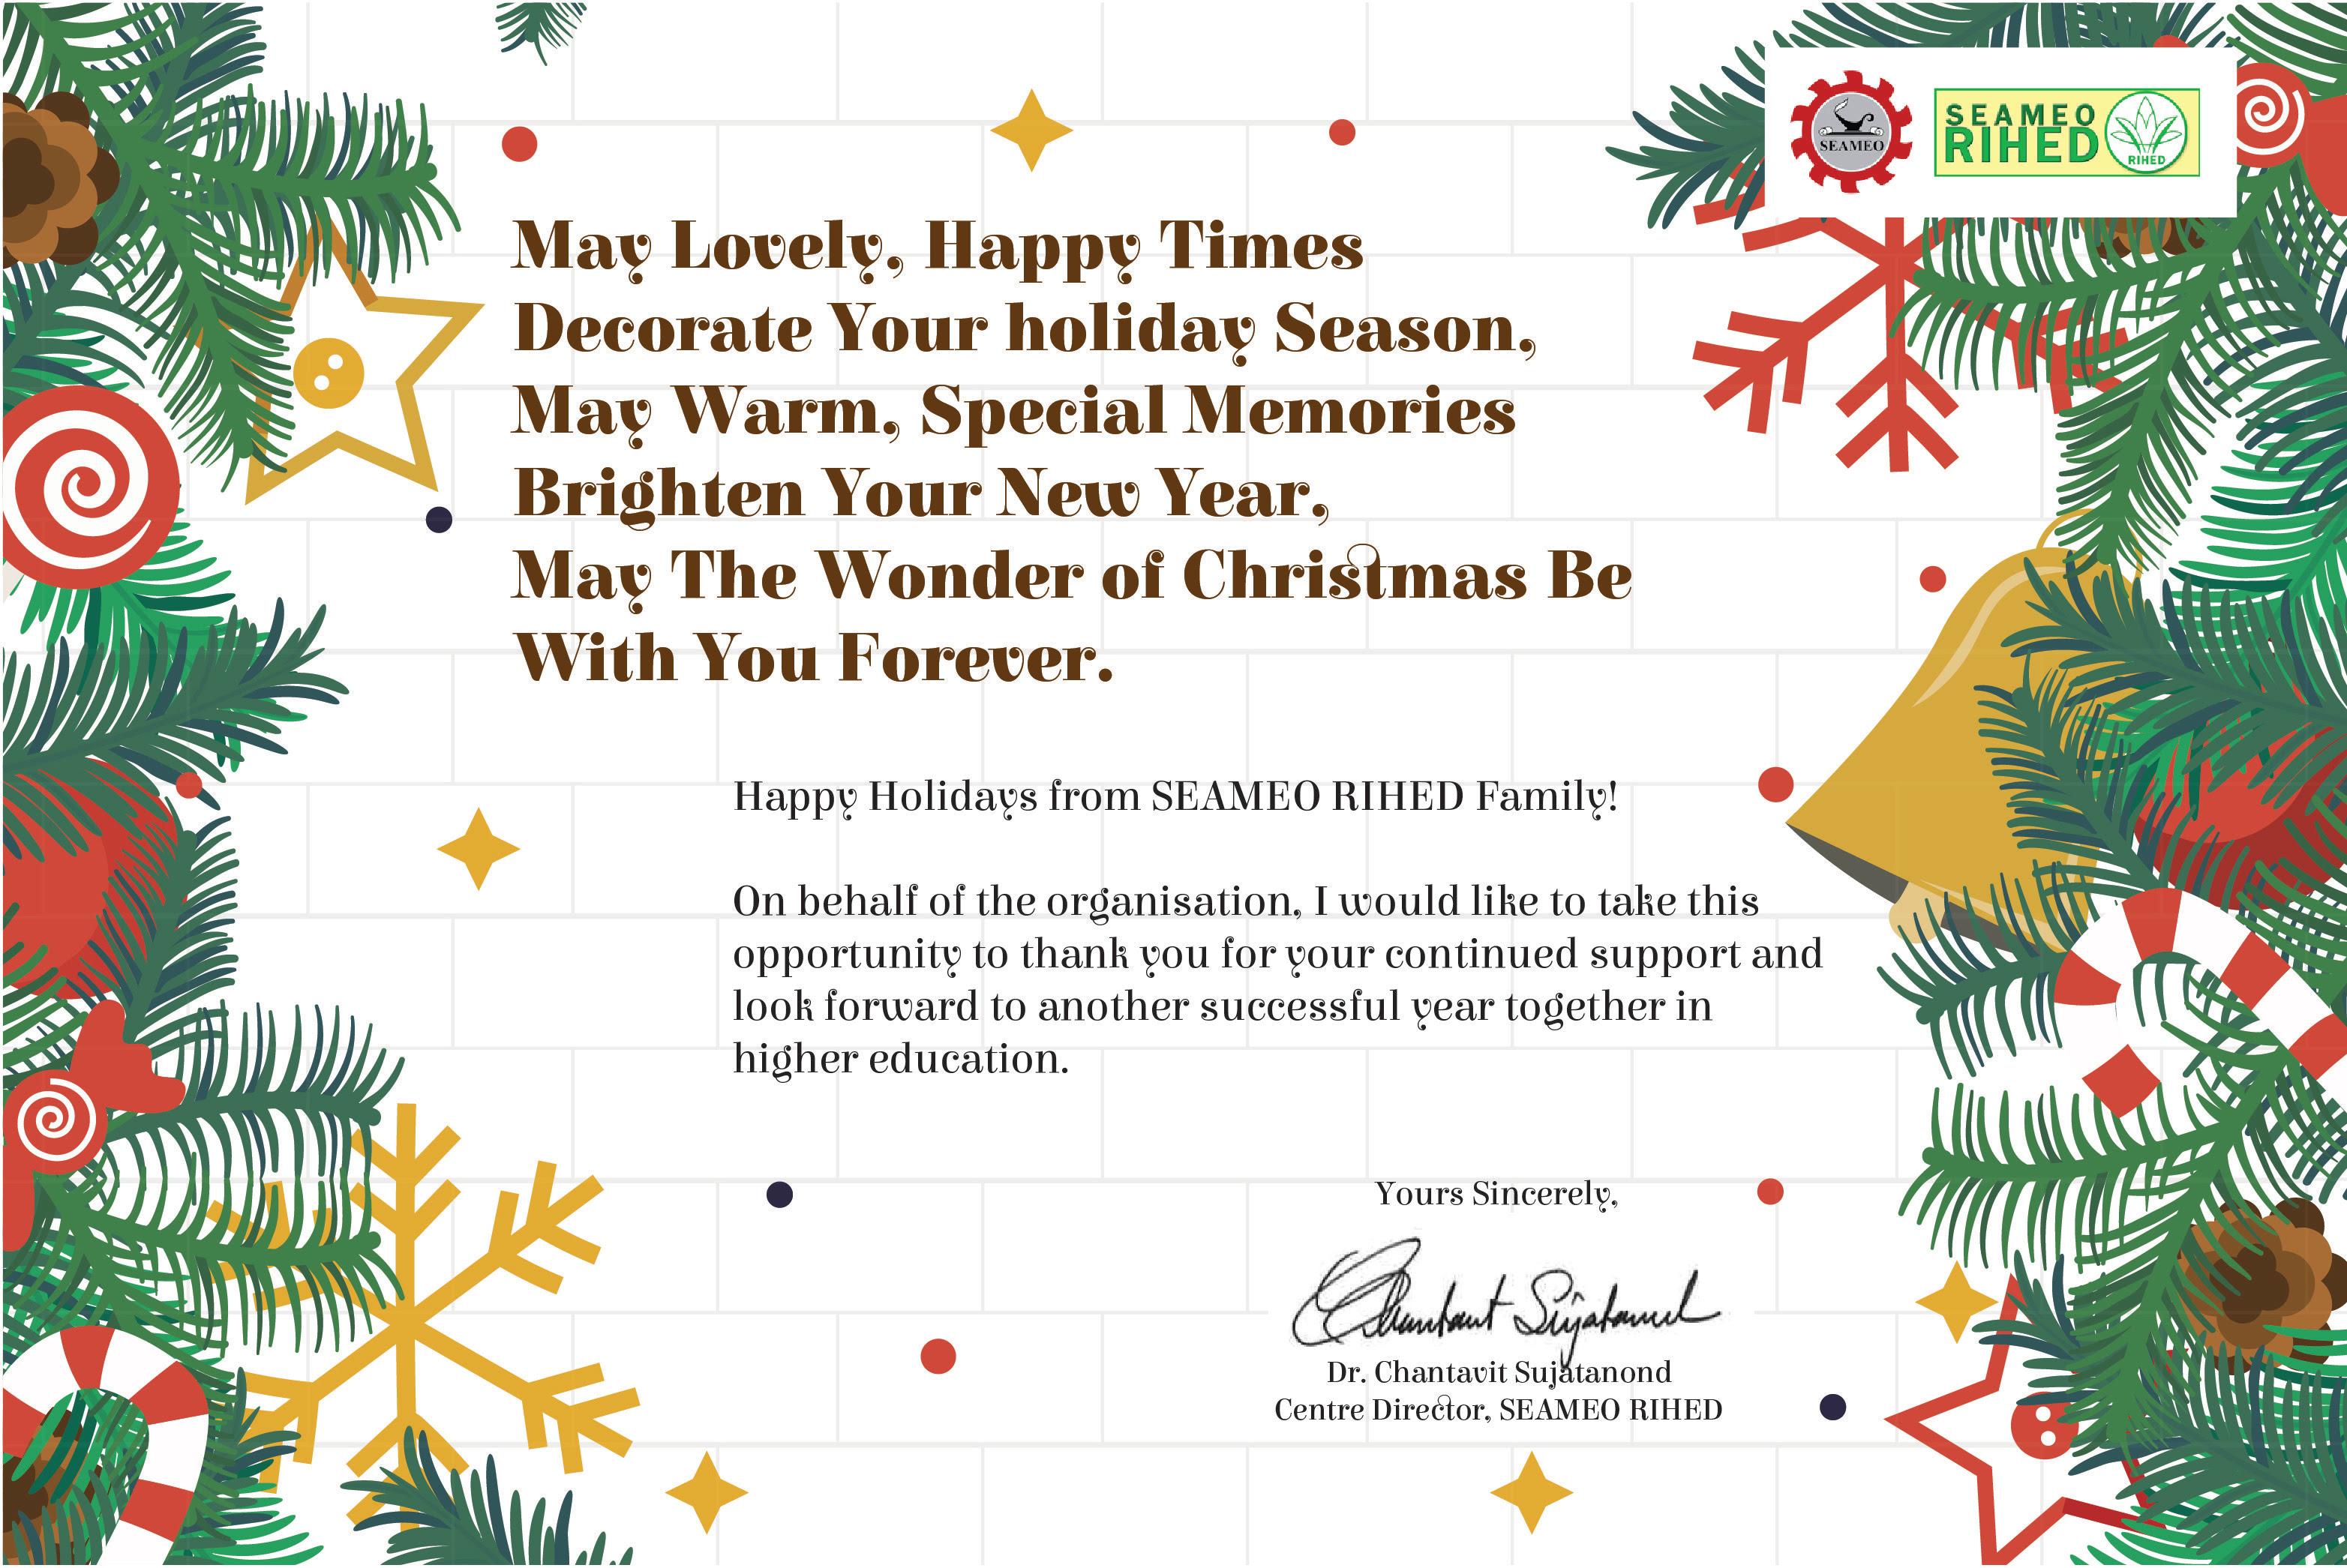 Holiday greetings from seameo rihed seameo rihed holiday greetings from seameo rihed kristyandbryce Choice Image